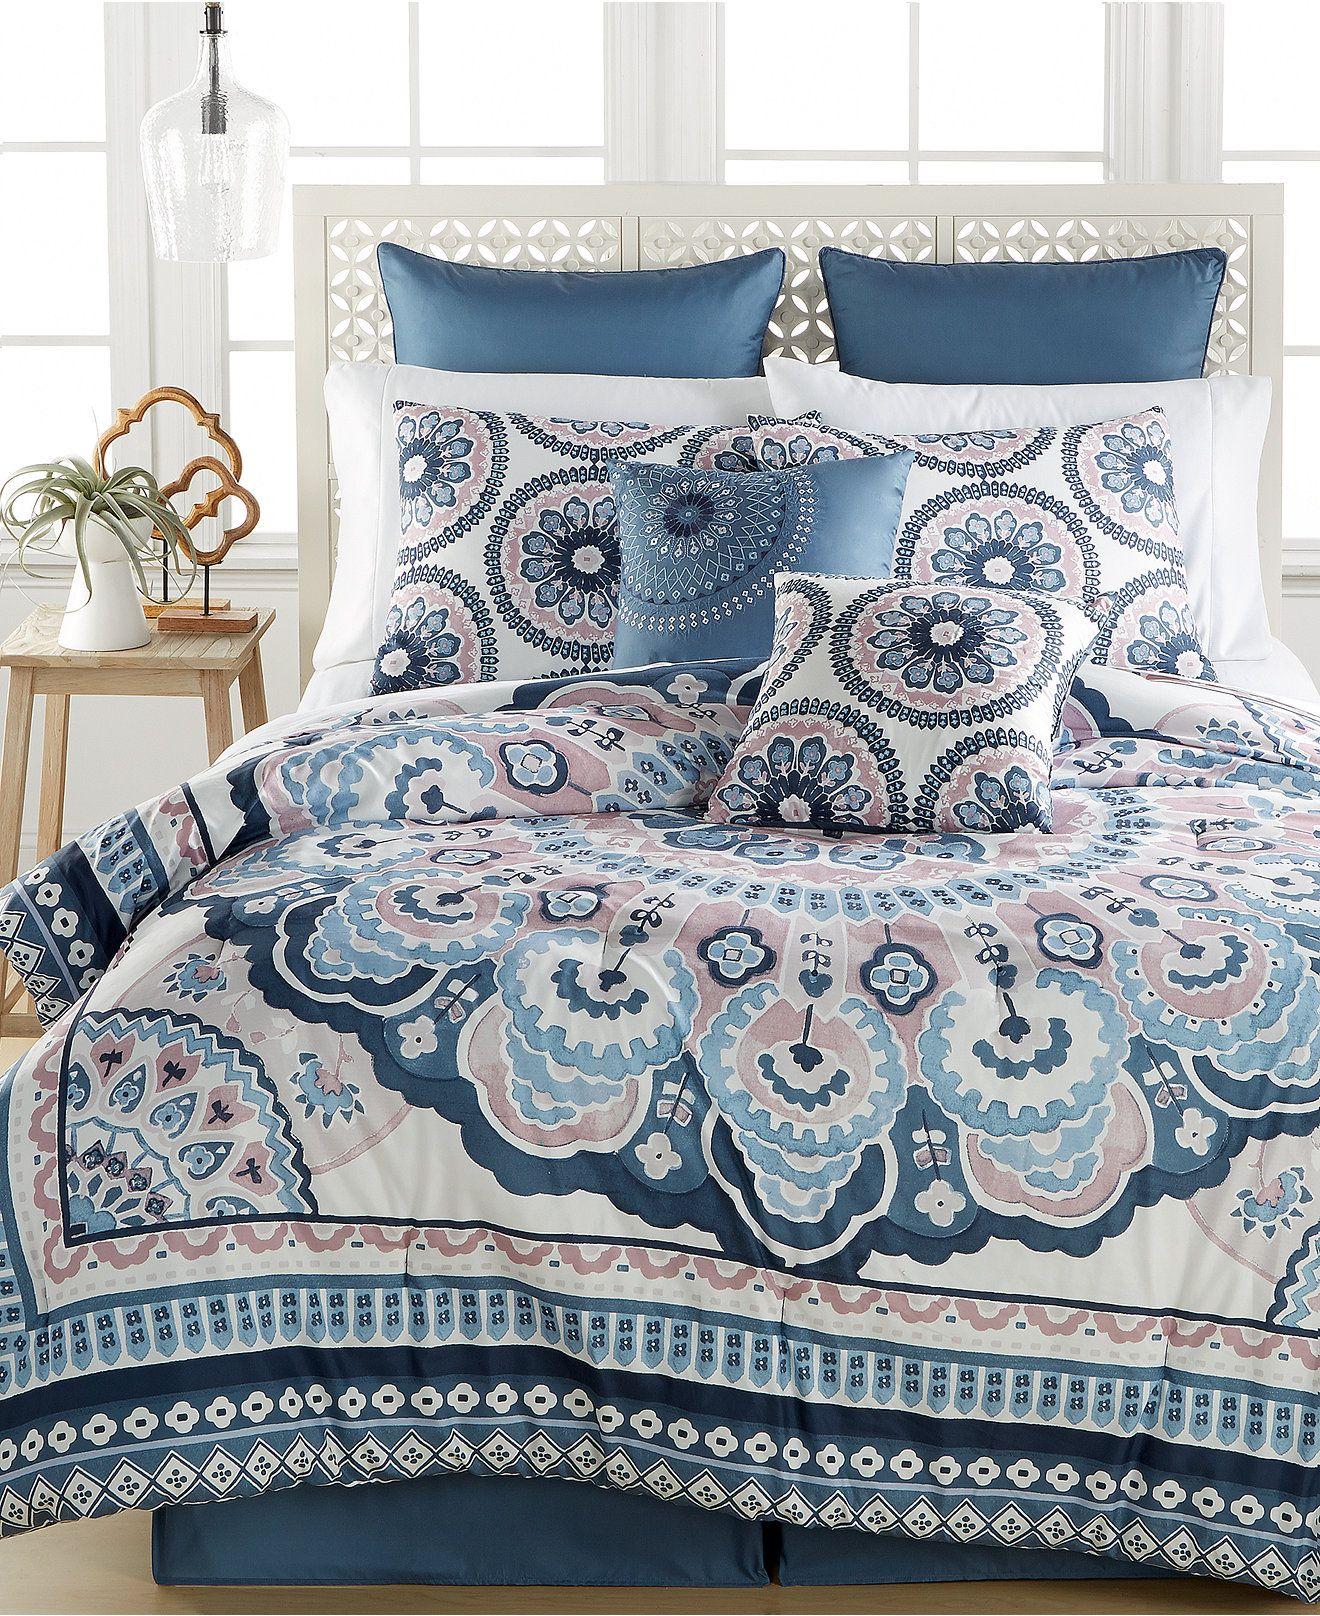 8 piece comforter set king Florentine 8 Piece Comforter Sets | Comforter, Bath and Bedrooms 8 piece comforter set king